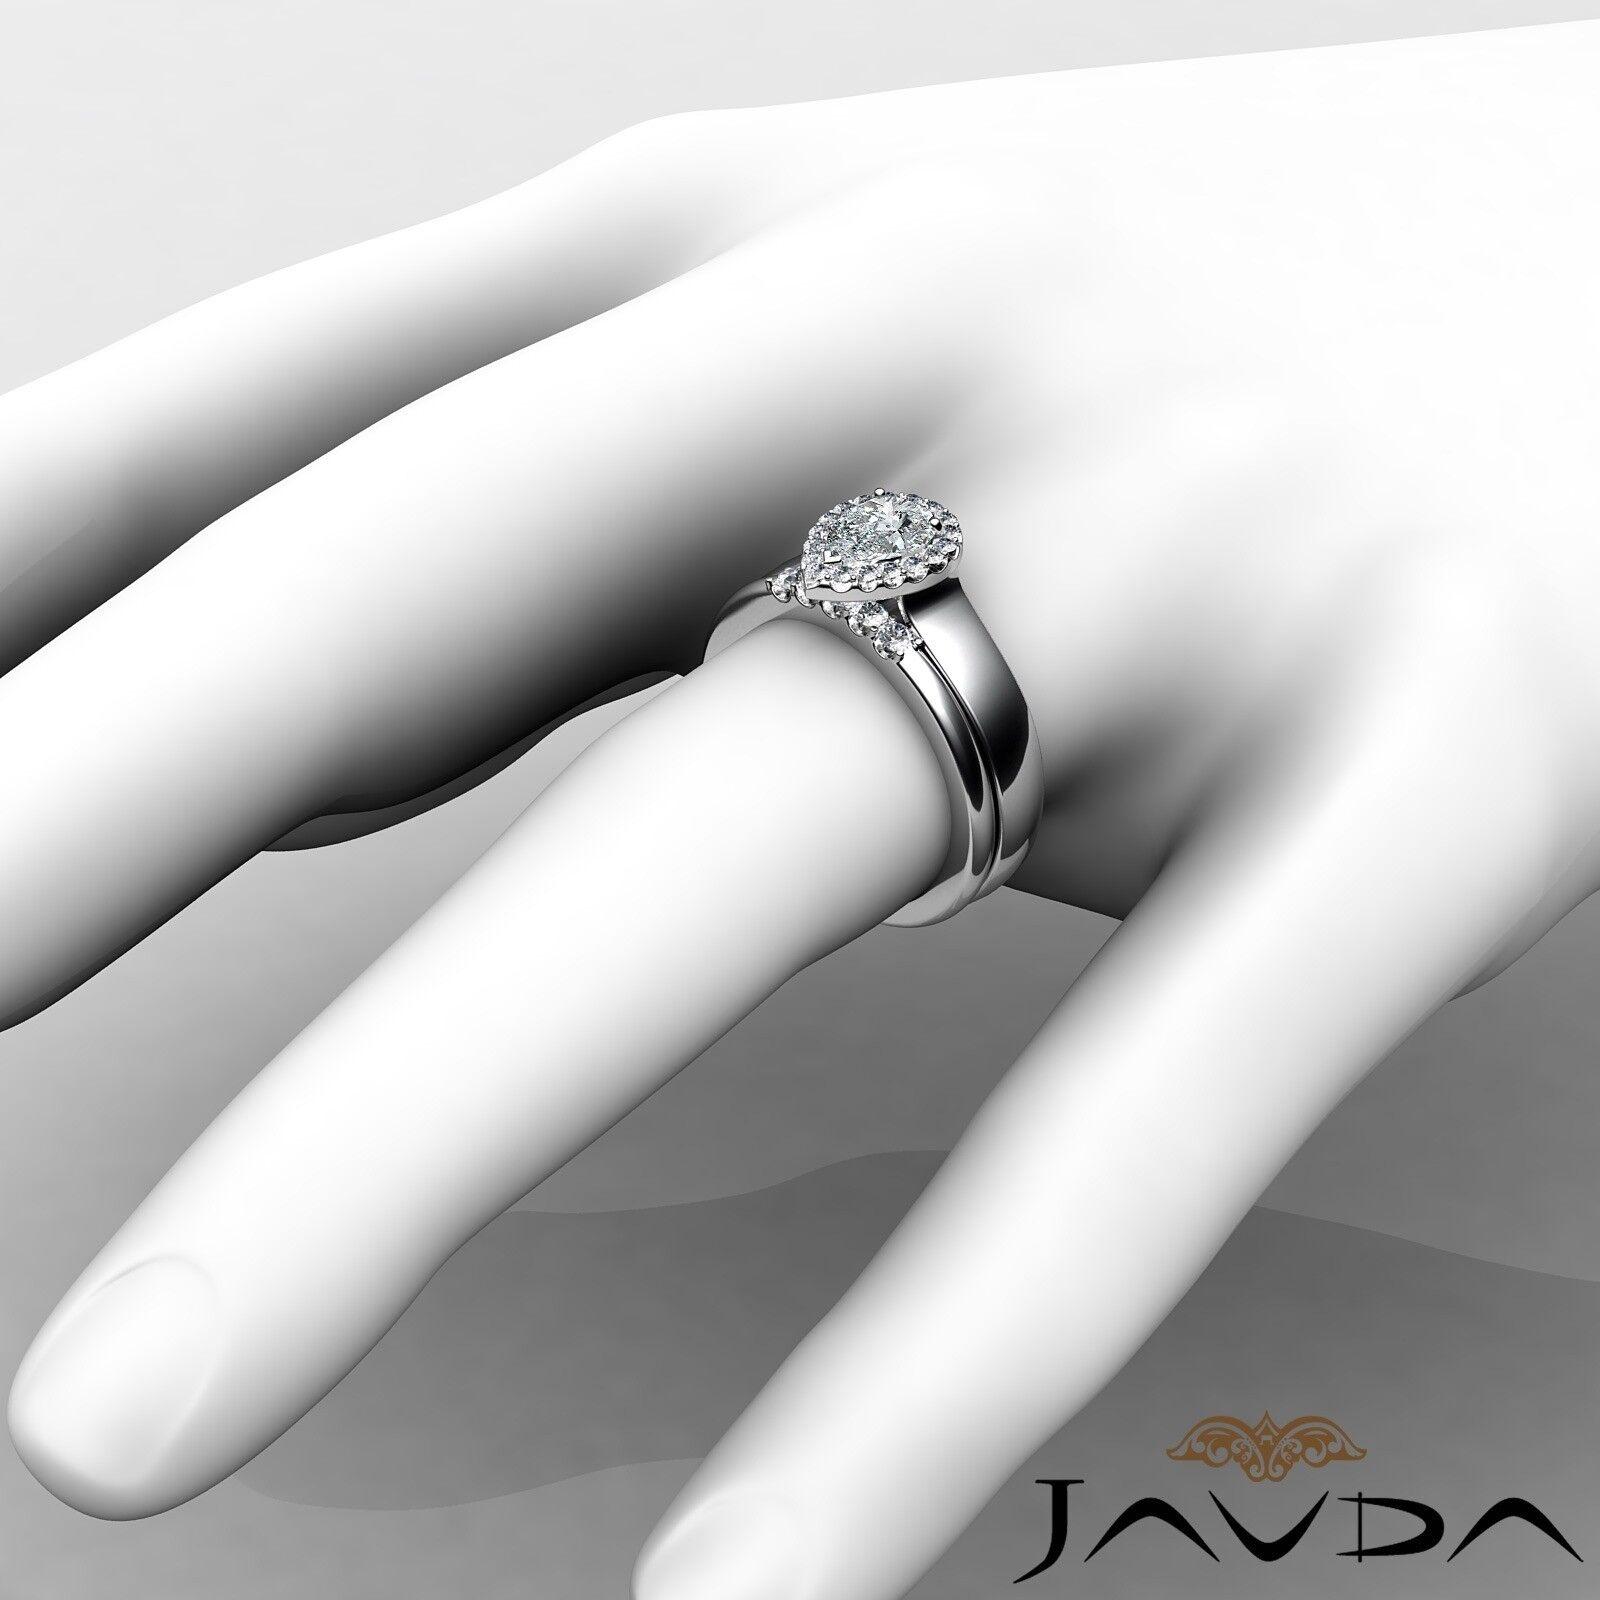 1.33ctw U Cut Pave Set Halo Bridal Pear Diamond Engagement Ring GIA F-VS2 W Gold 4